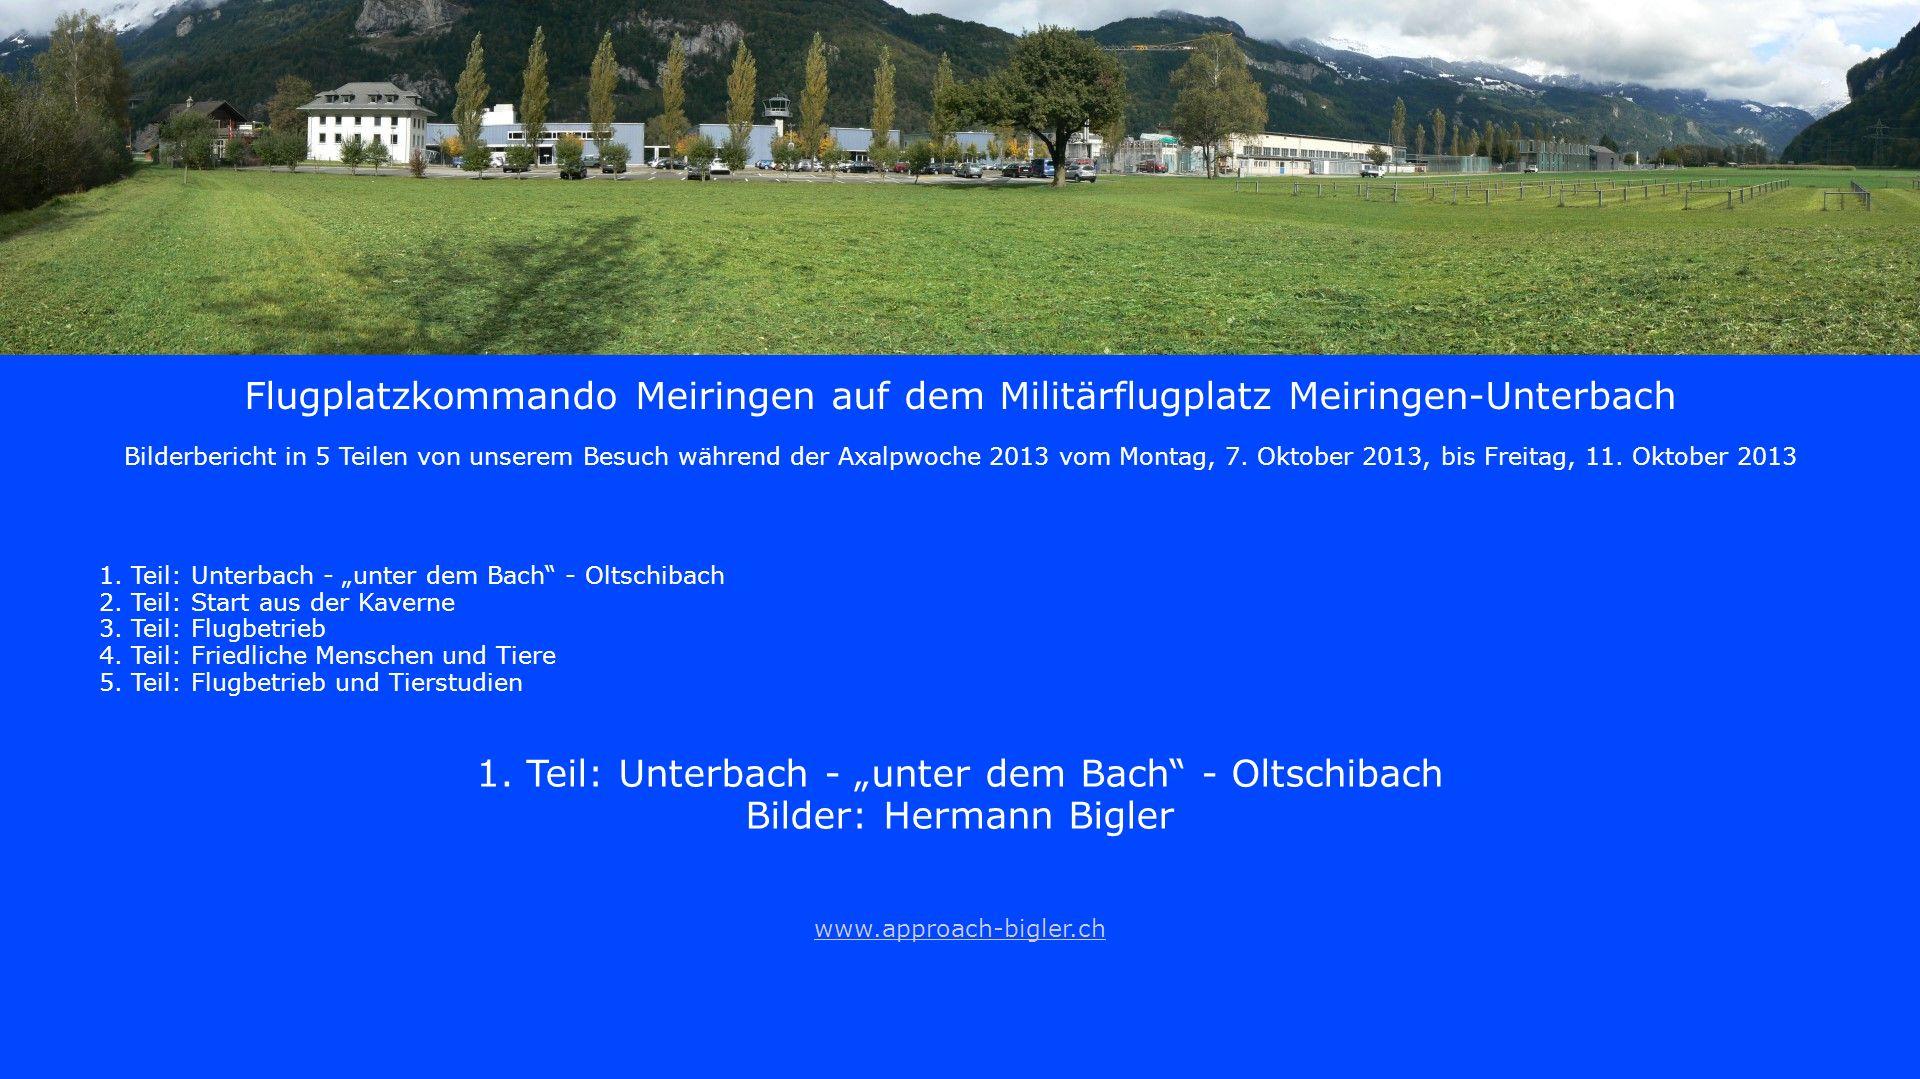 "1. Teil: Unterbach - ""unter dem Bach - Oltschibach"